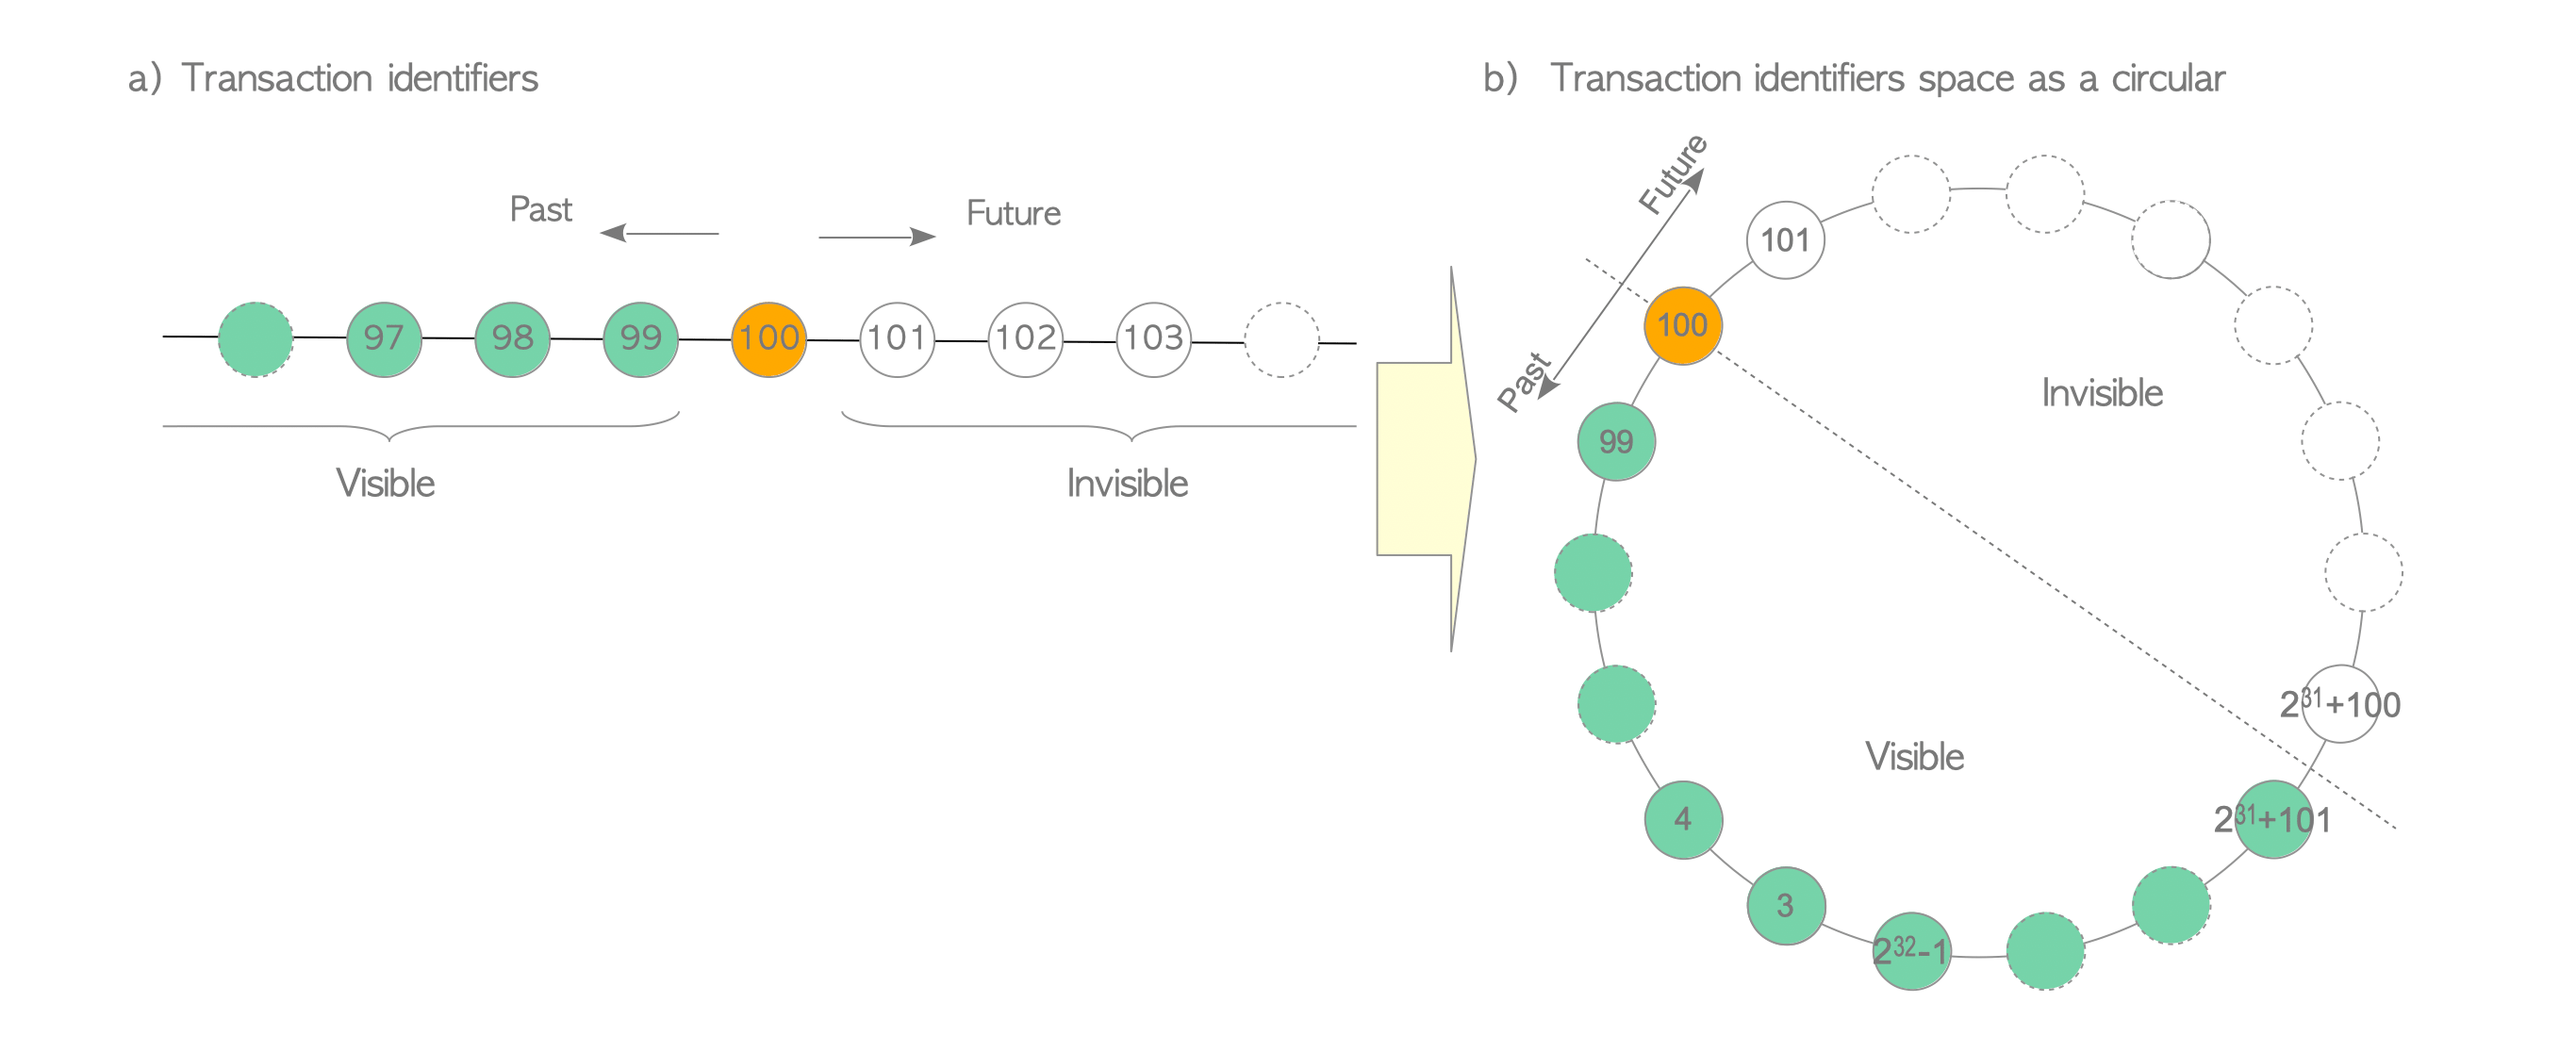 Fig. 5.1. Transaction ids in PostgreSQL.